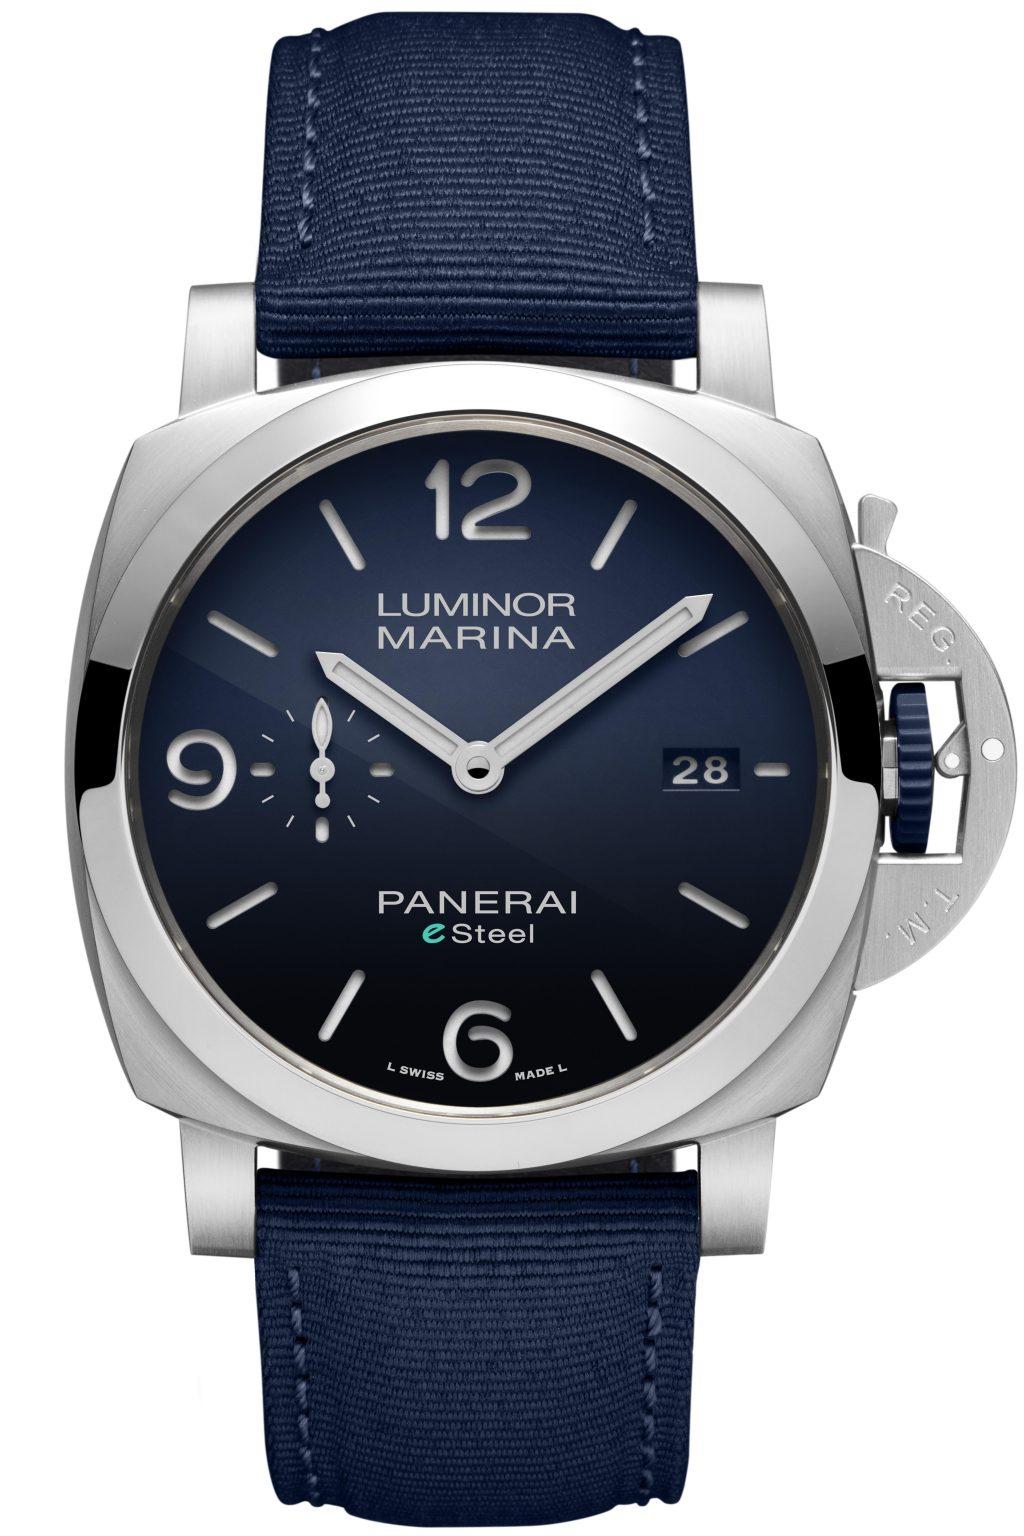 Panerai 'Luminor Marina eSteelTM' watch